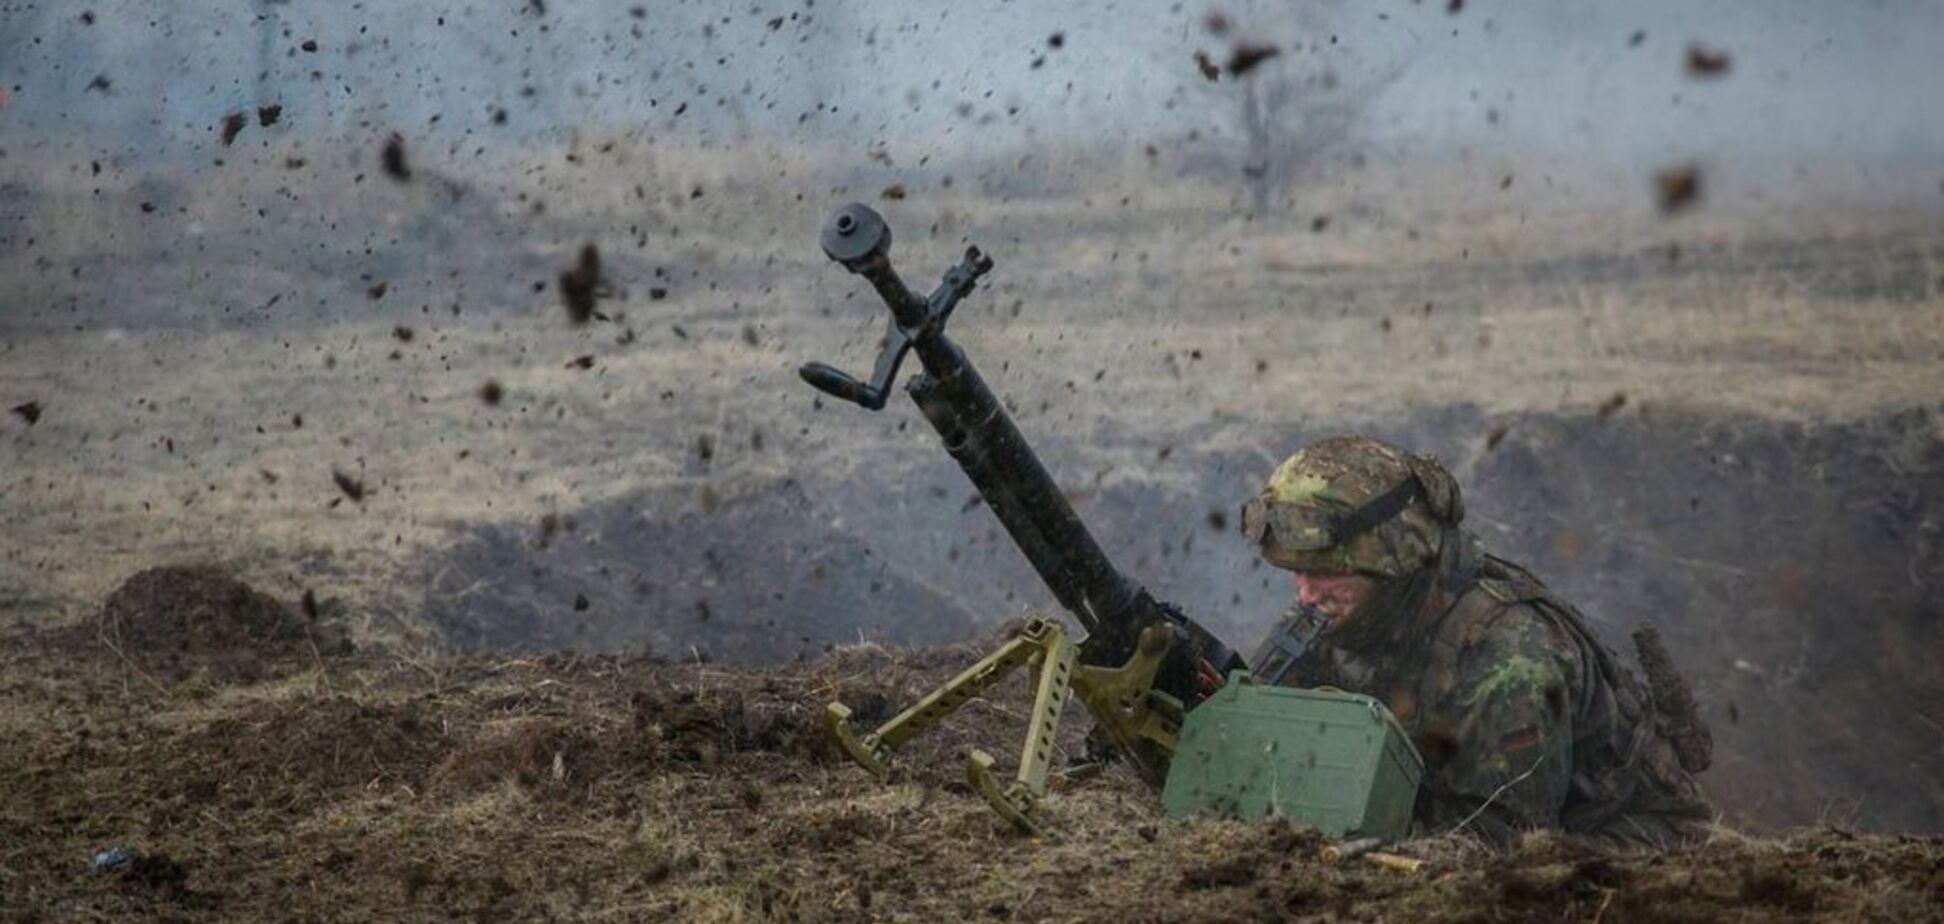 На Донбассе развязались адские бои: много жертв